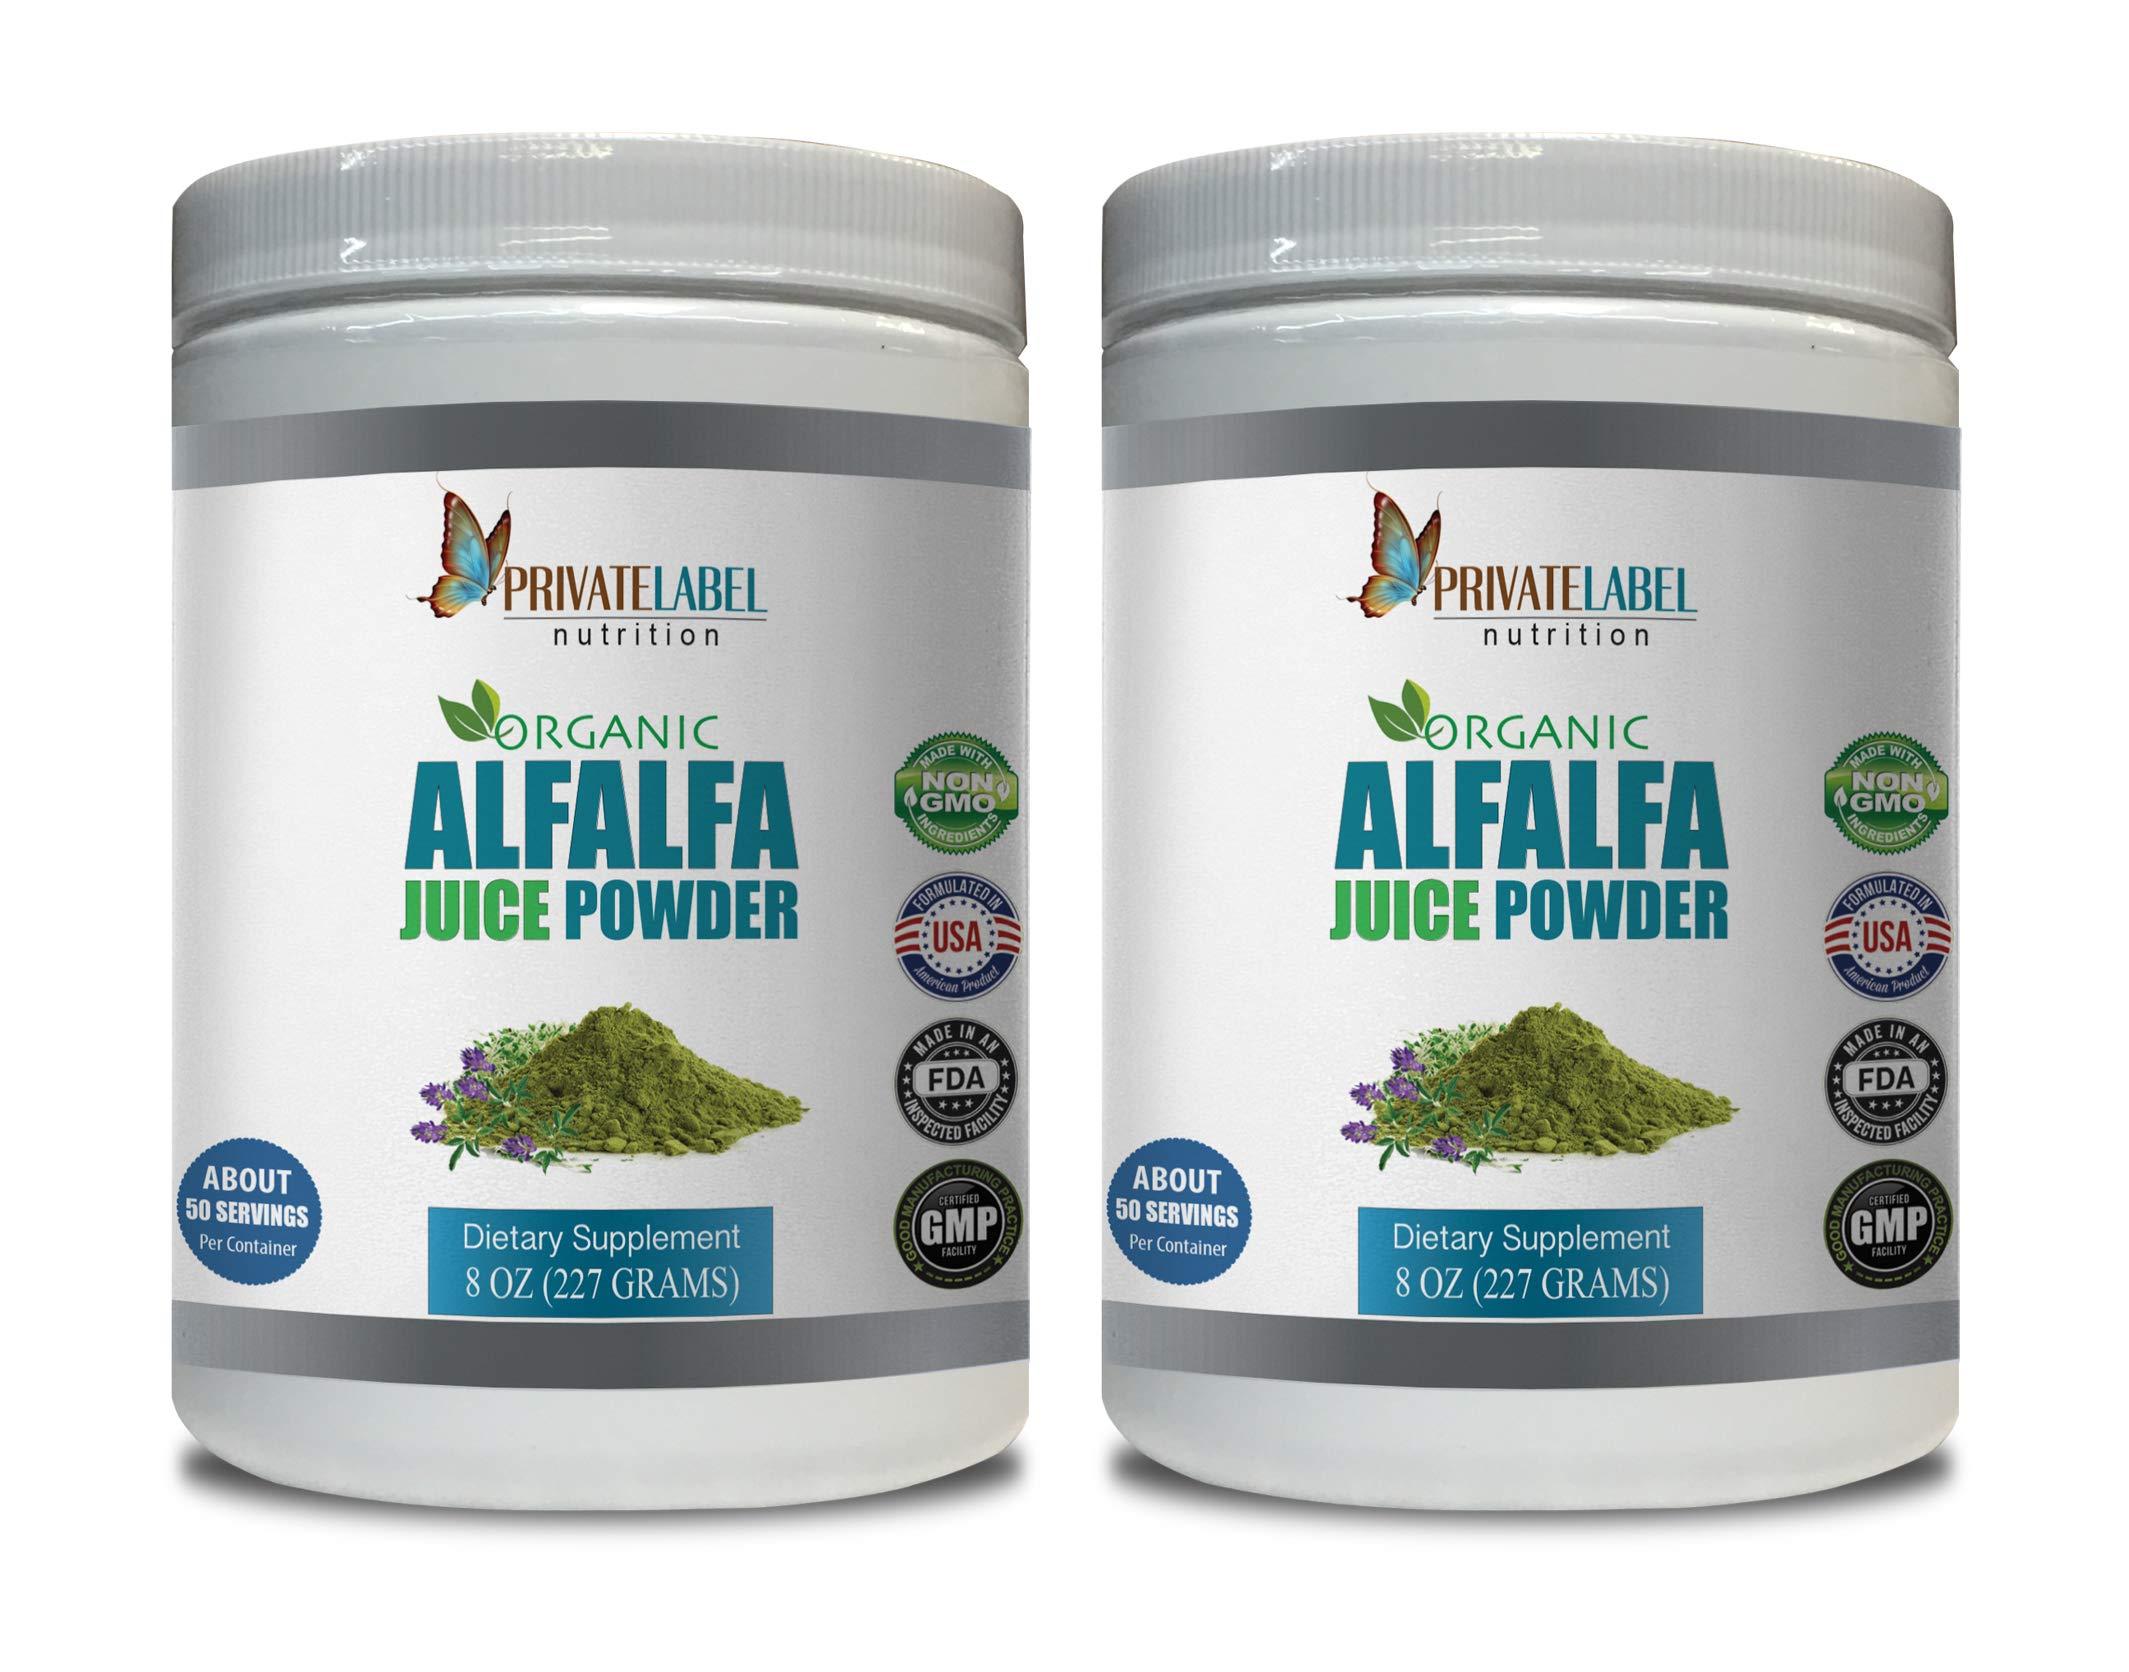 Immune System for Adults - Alfalfa Juice Organic Powder - Alfalfa Organic Powder - 2 Cans 16 OZ (100 Servings)